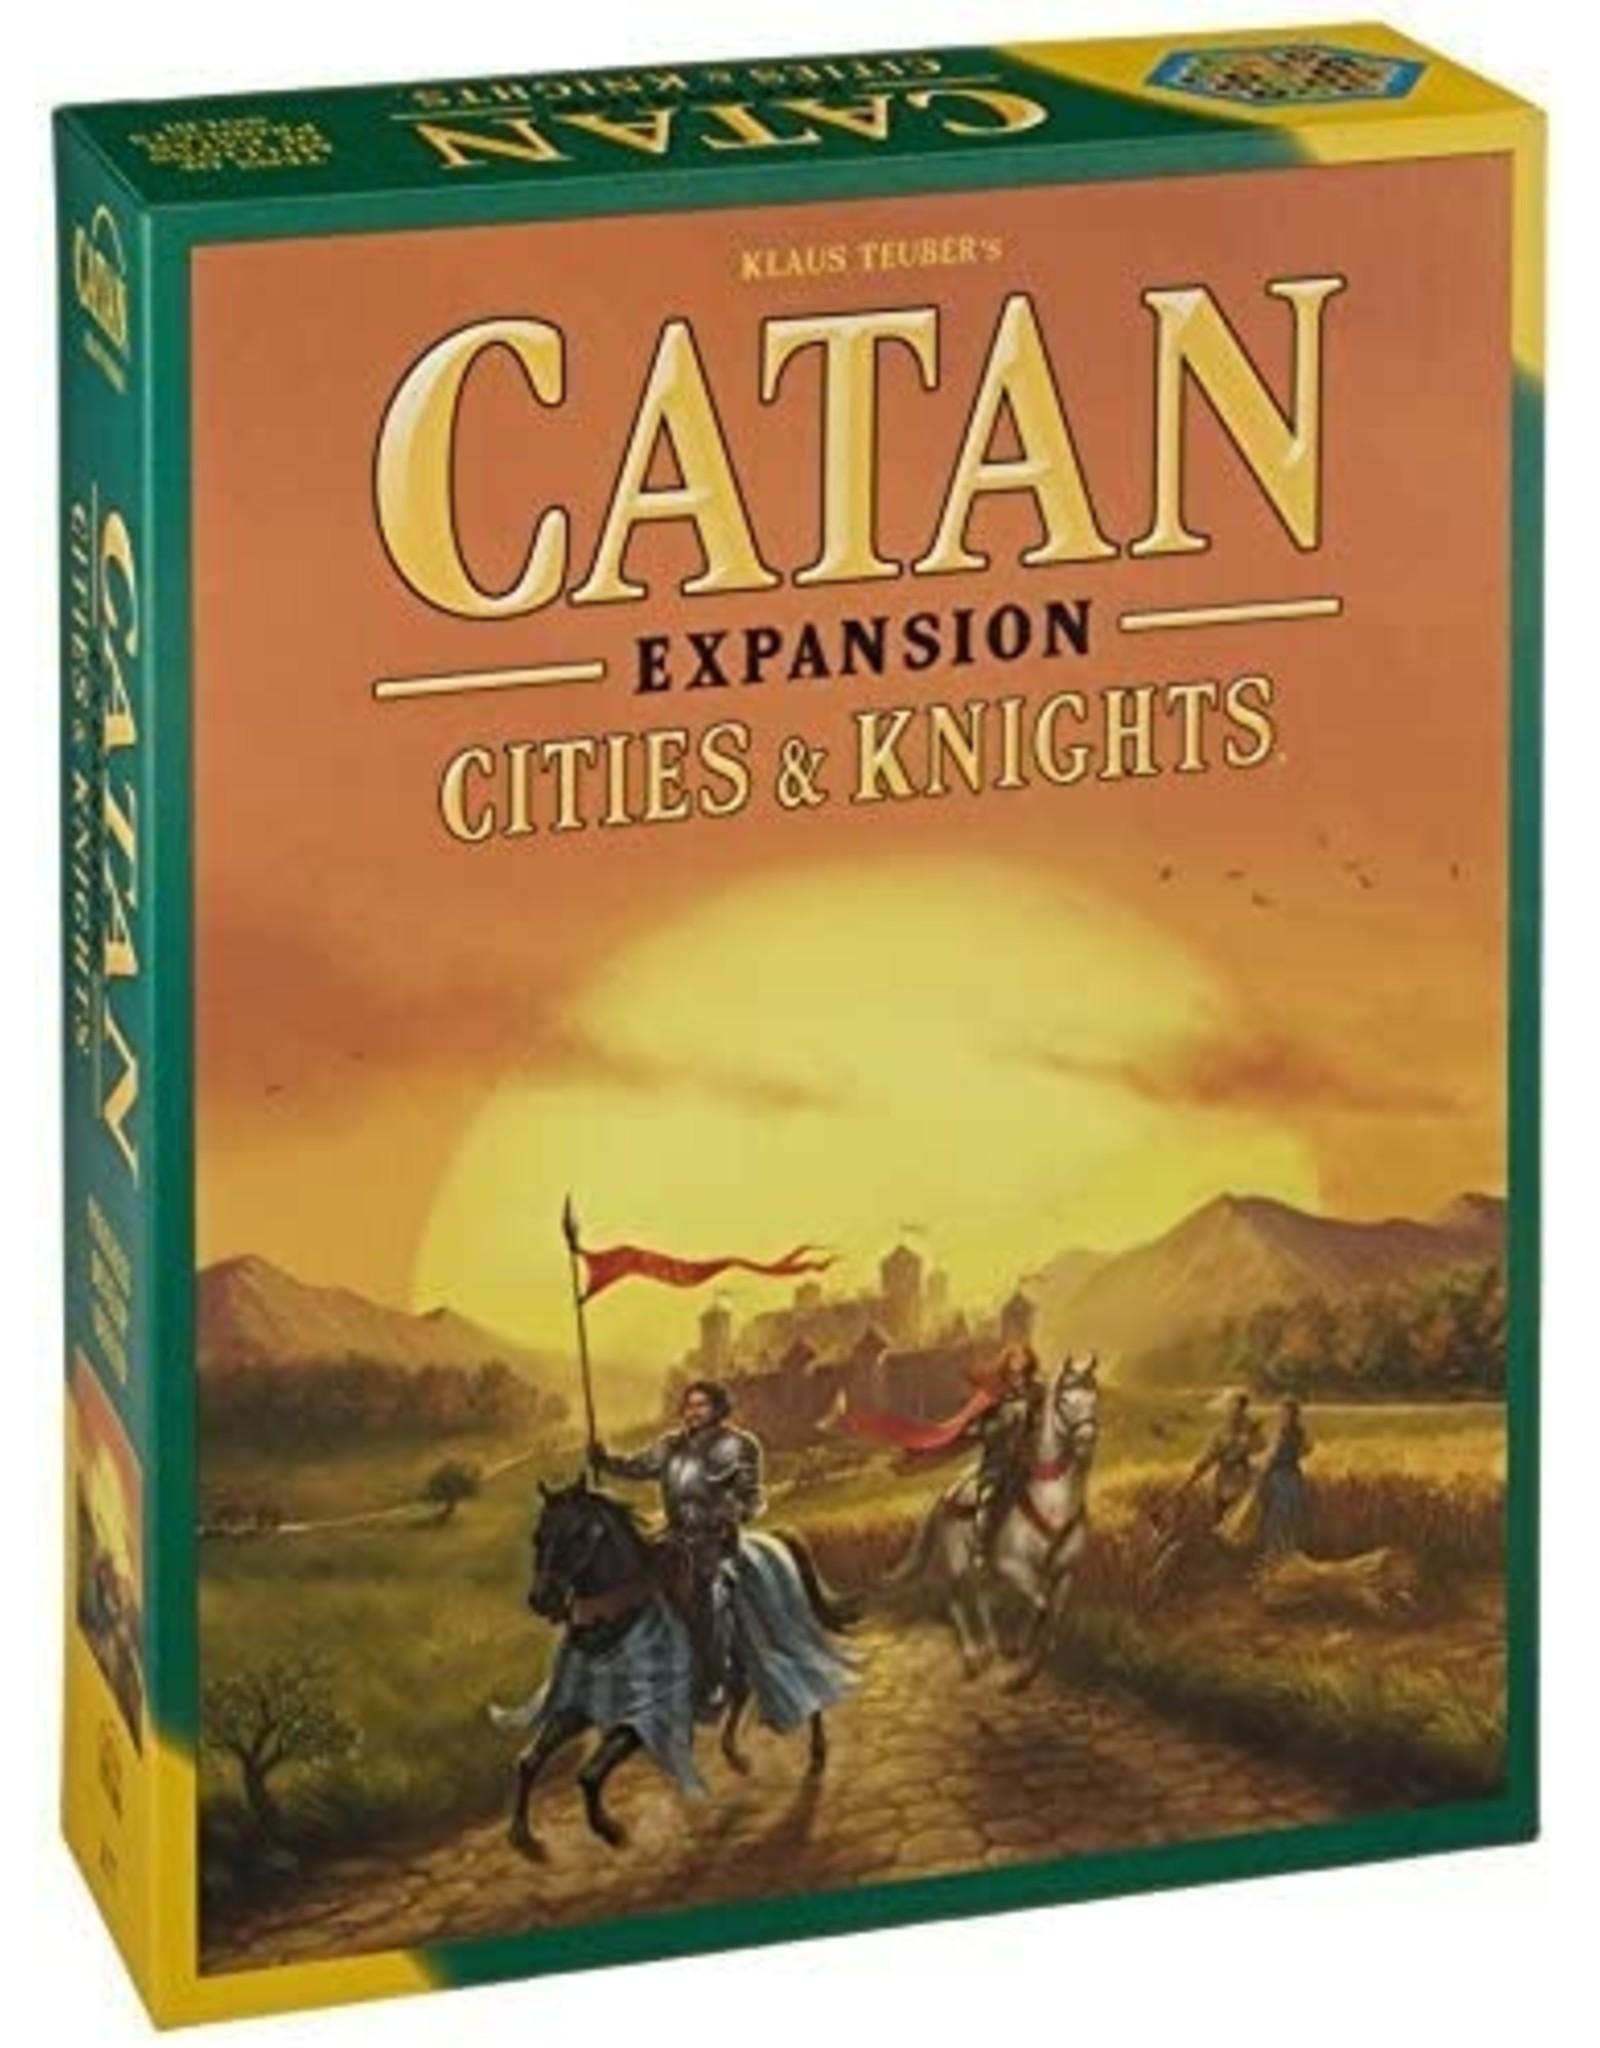 Catan Studio Catan: Cities & Knights Expansion